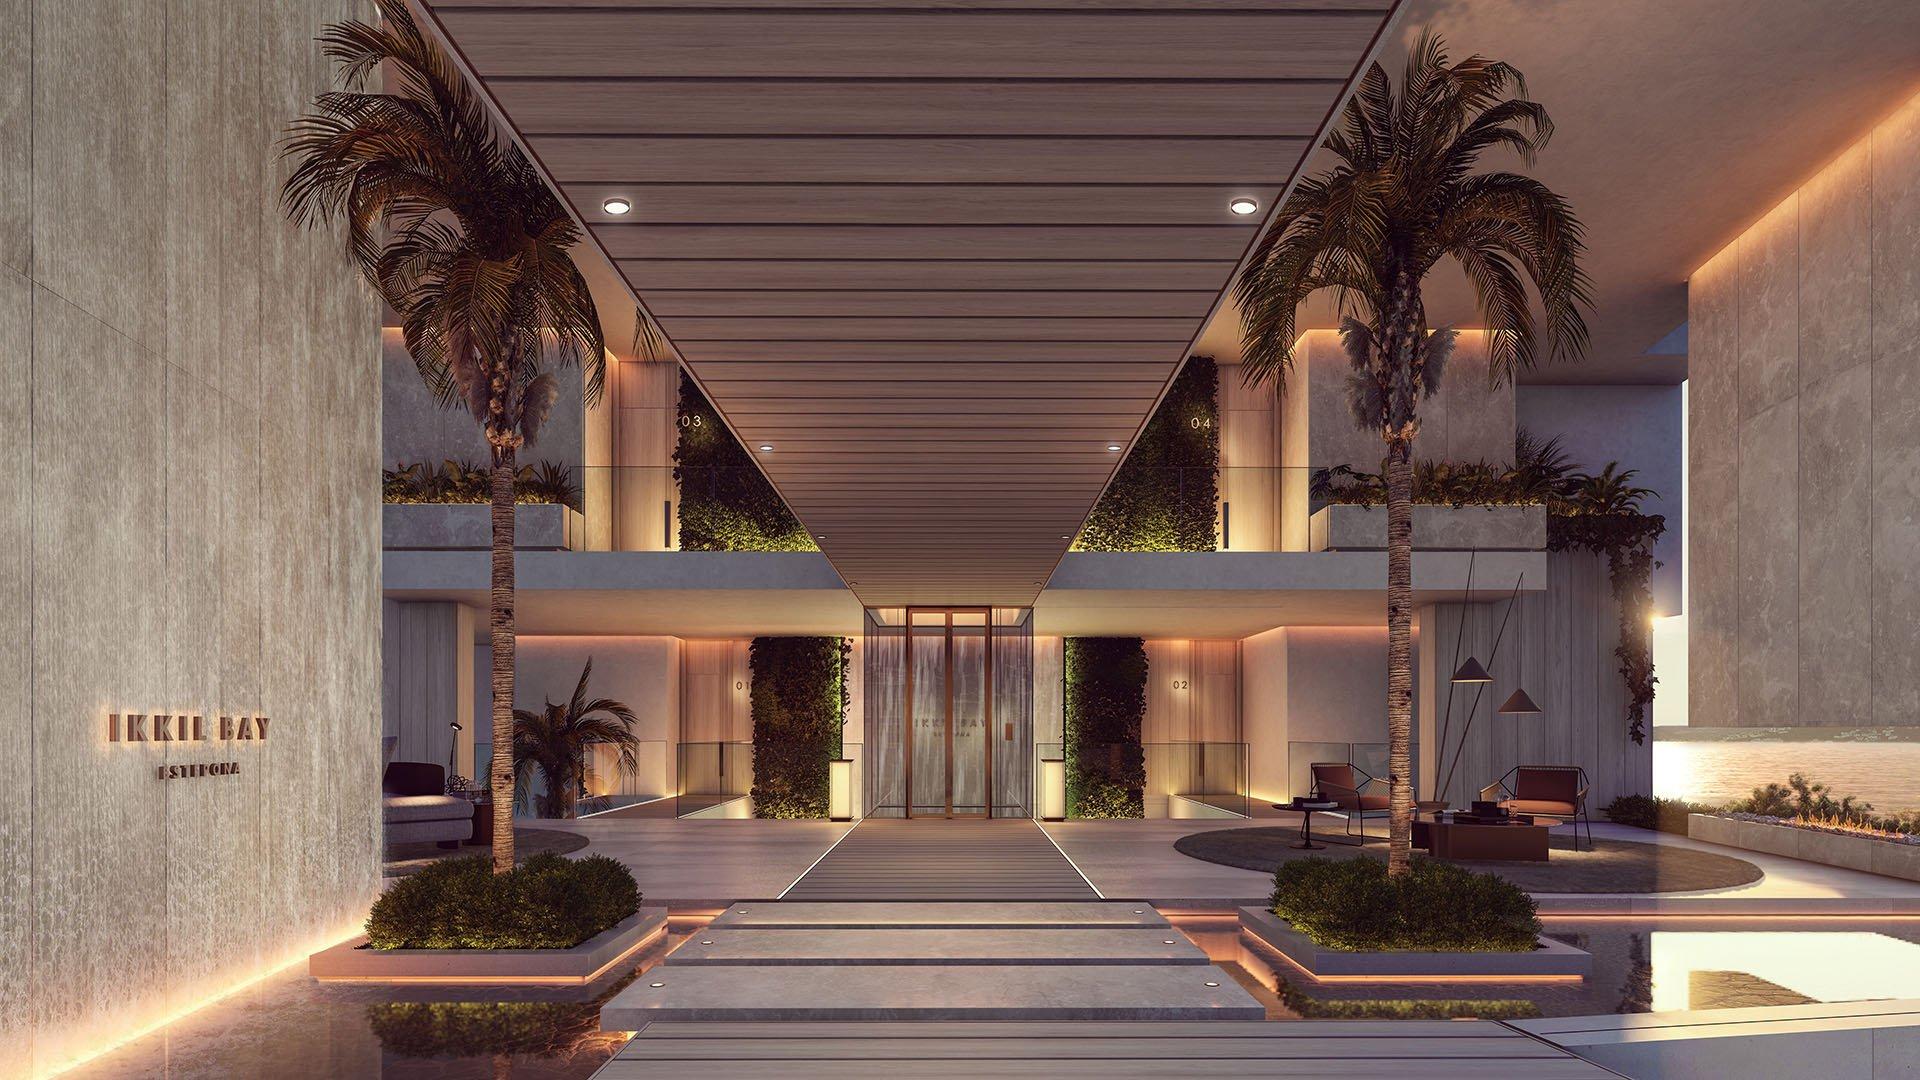 Ikkil Bay: Luxury front line beach apartments in Estepona